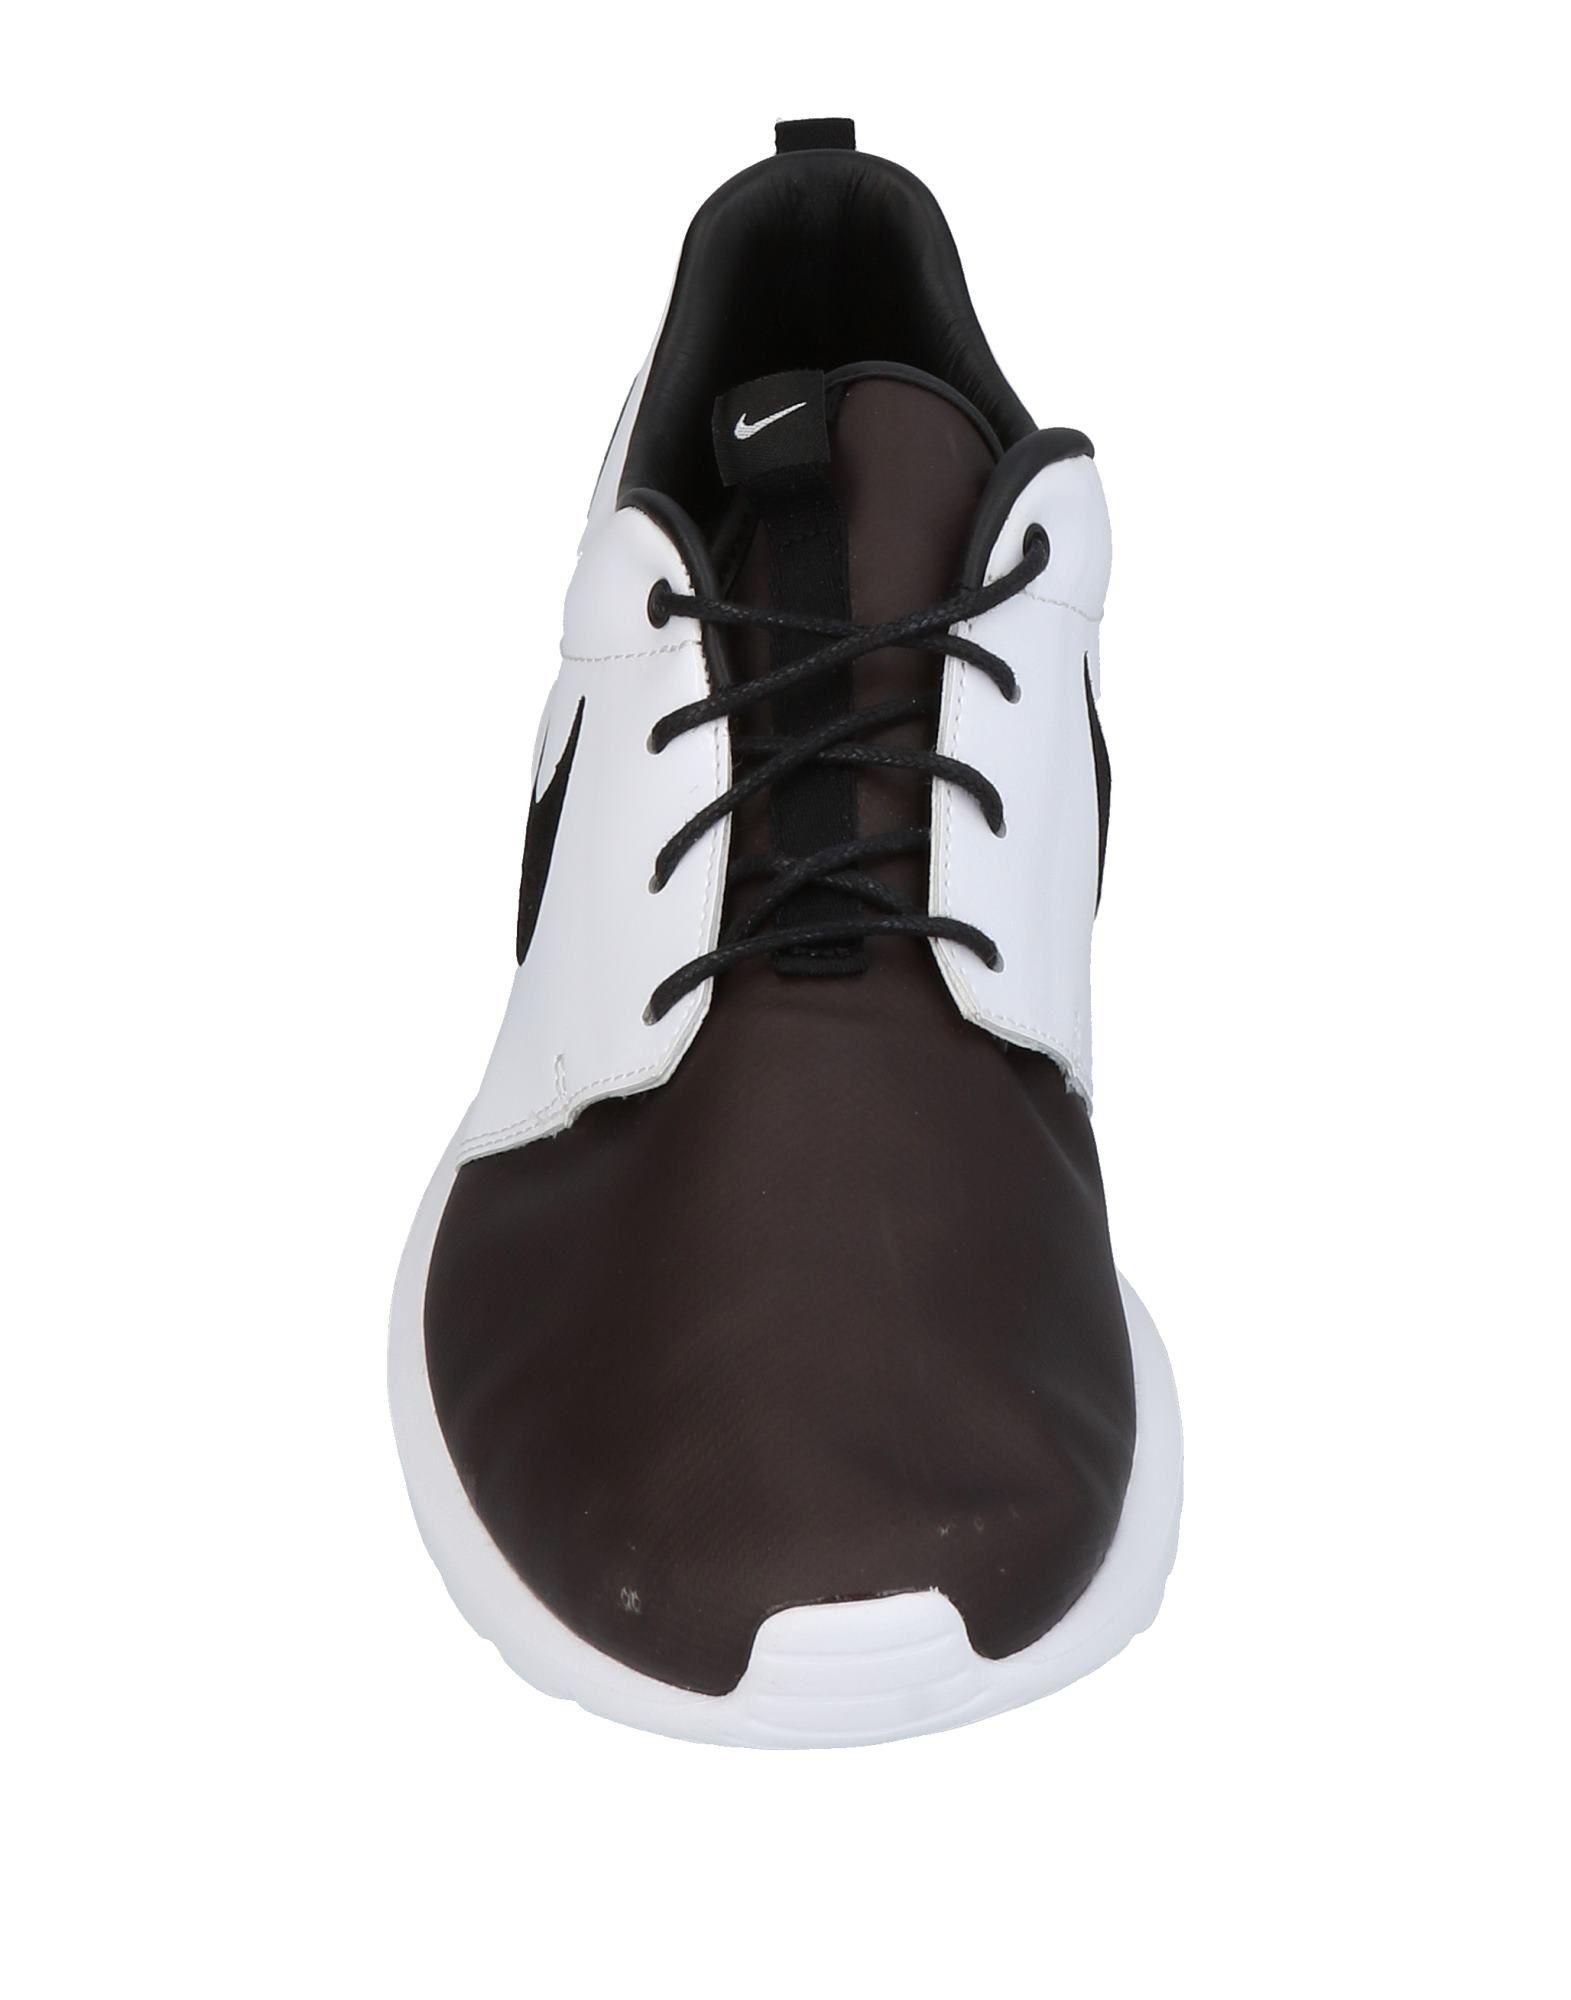 Nike Sneakers Damen  11448114HA 11448114HA 11448114HA Gute Qualität beliebte Schuhe 345139